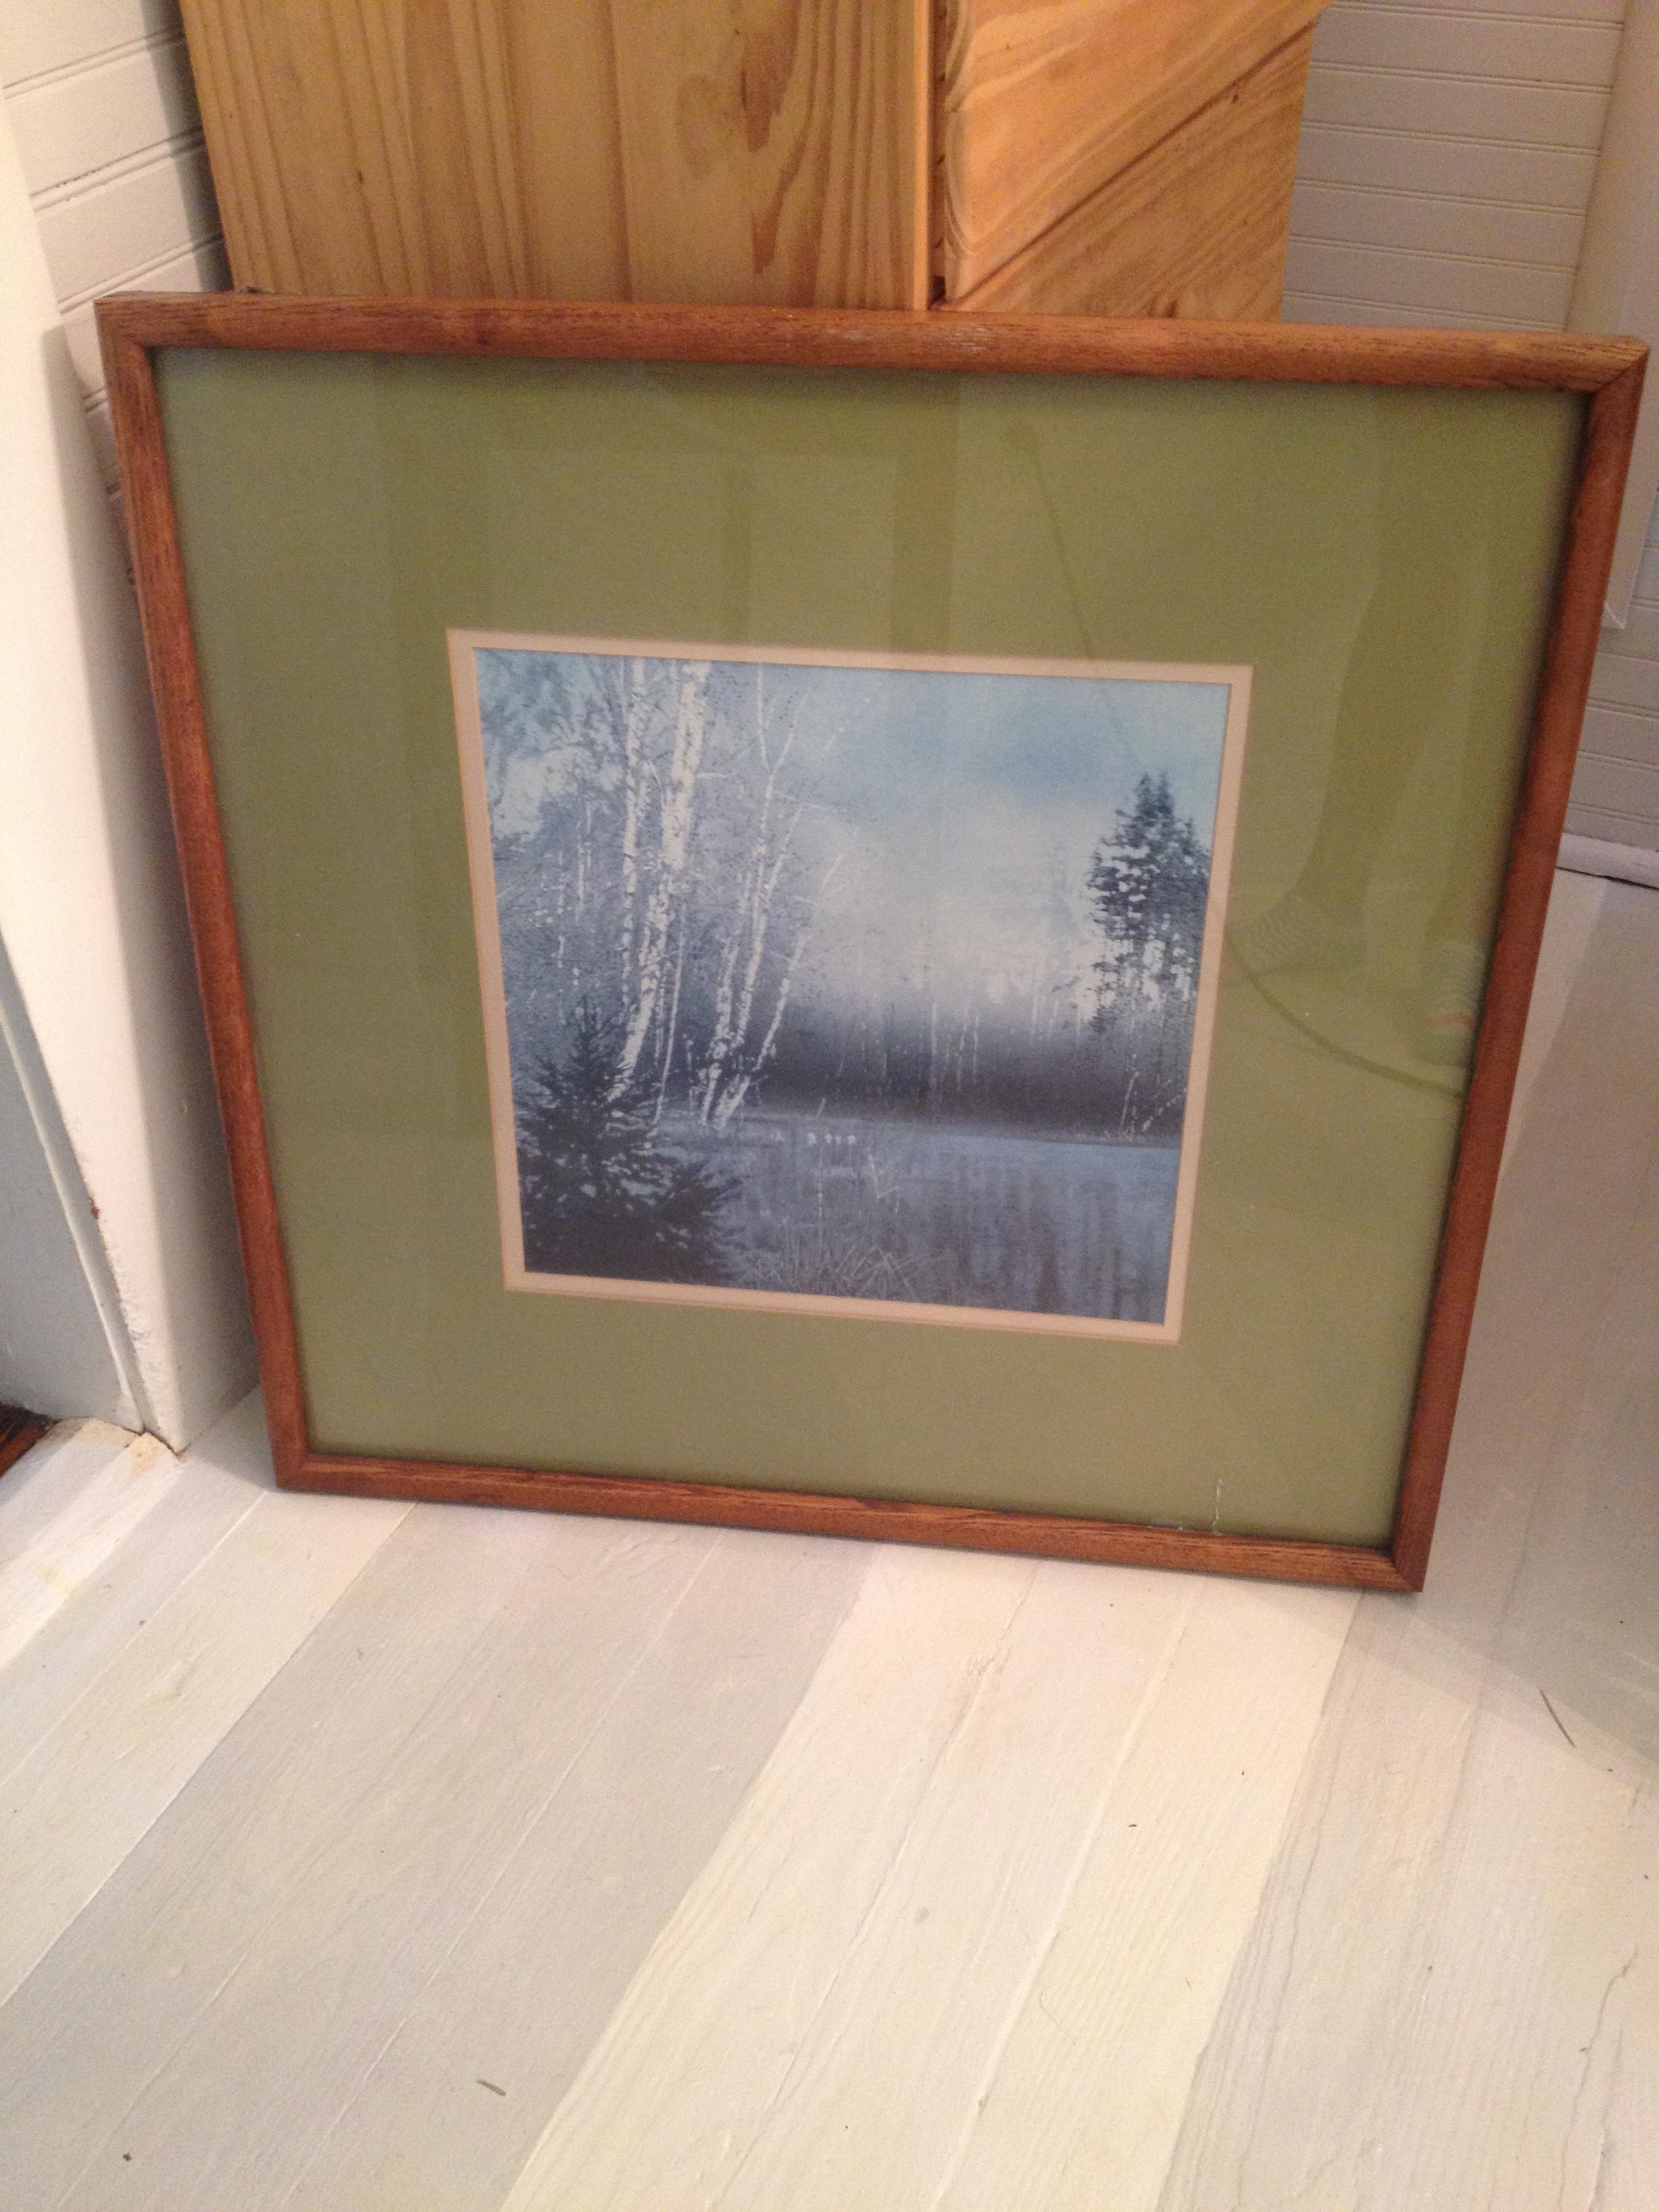 Goodwill frame